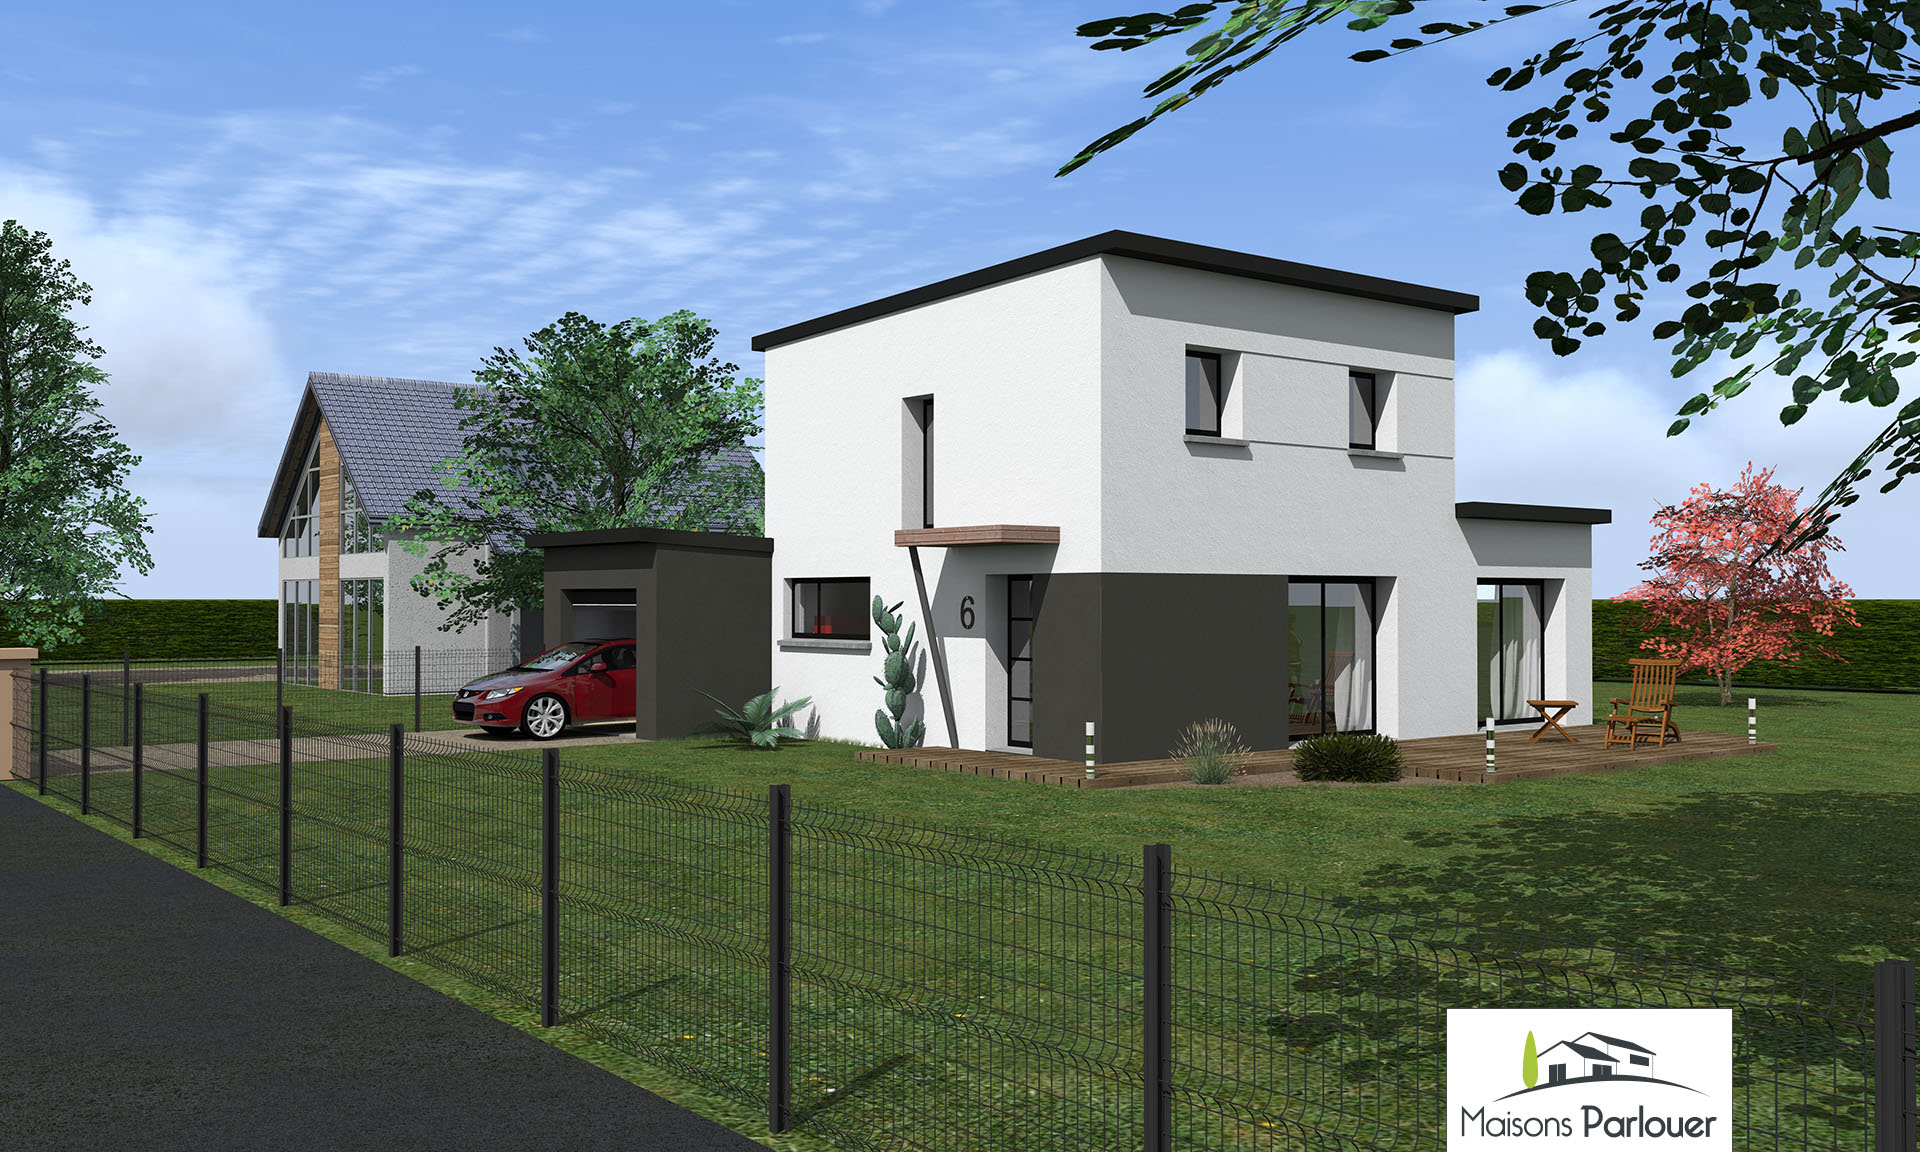 Maison etage 100m2 stunning plan maison pas cher with for Maison 100m2 etage